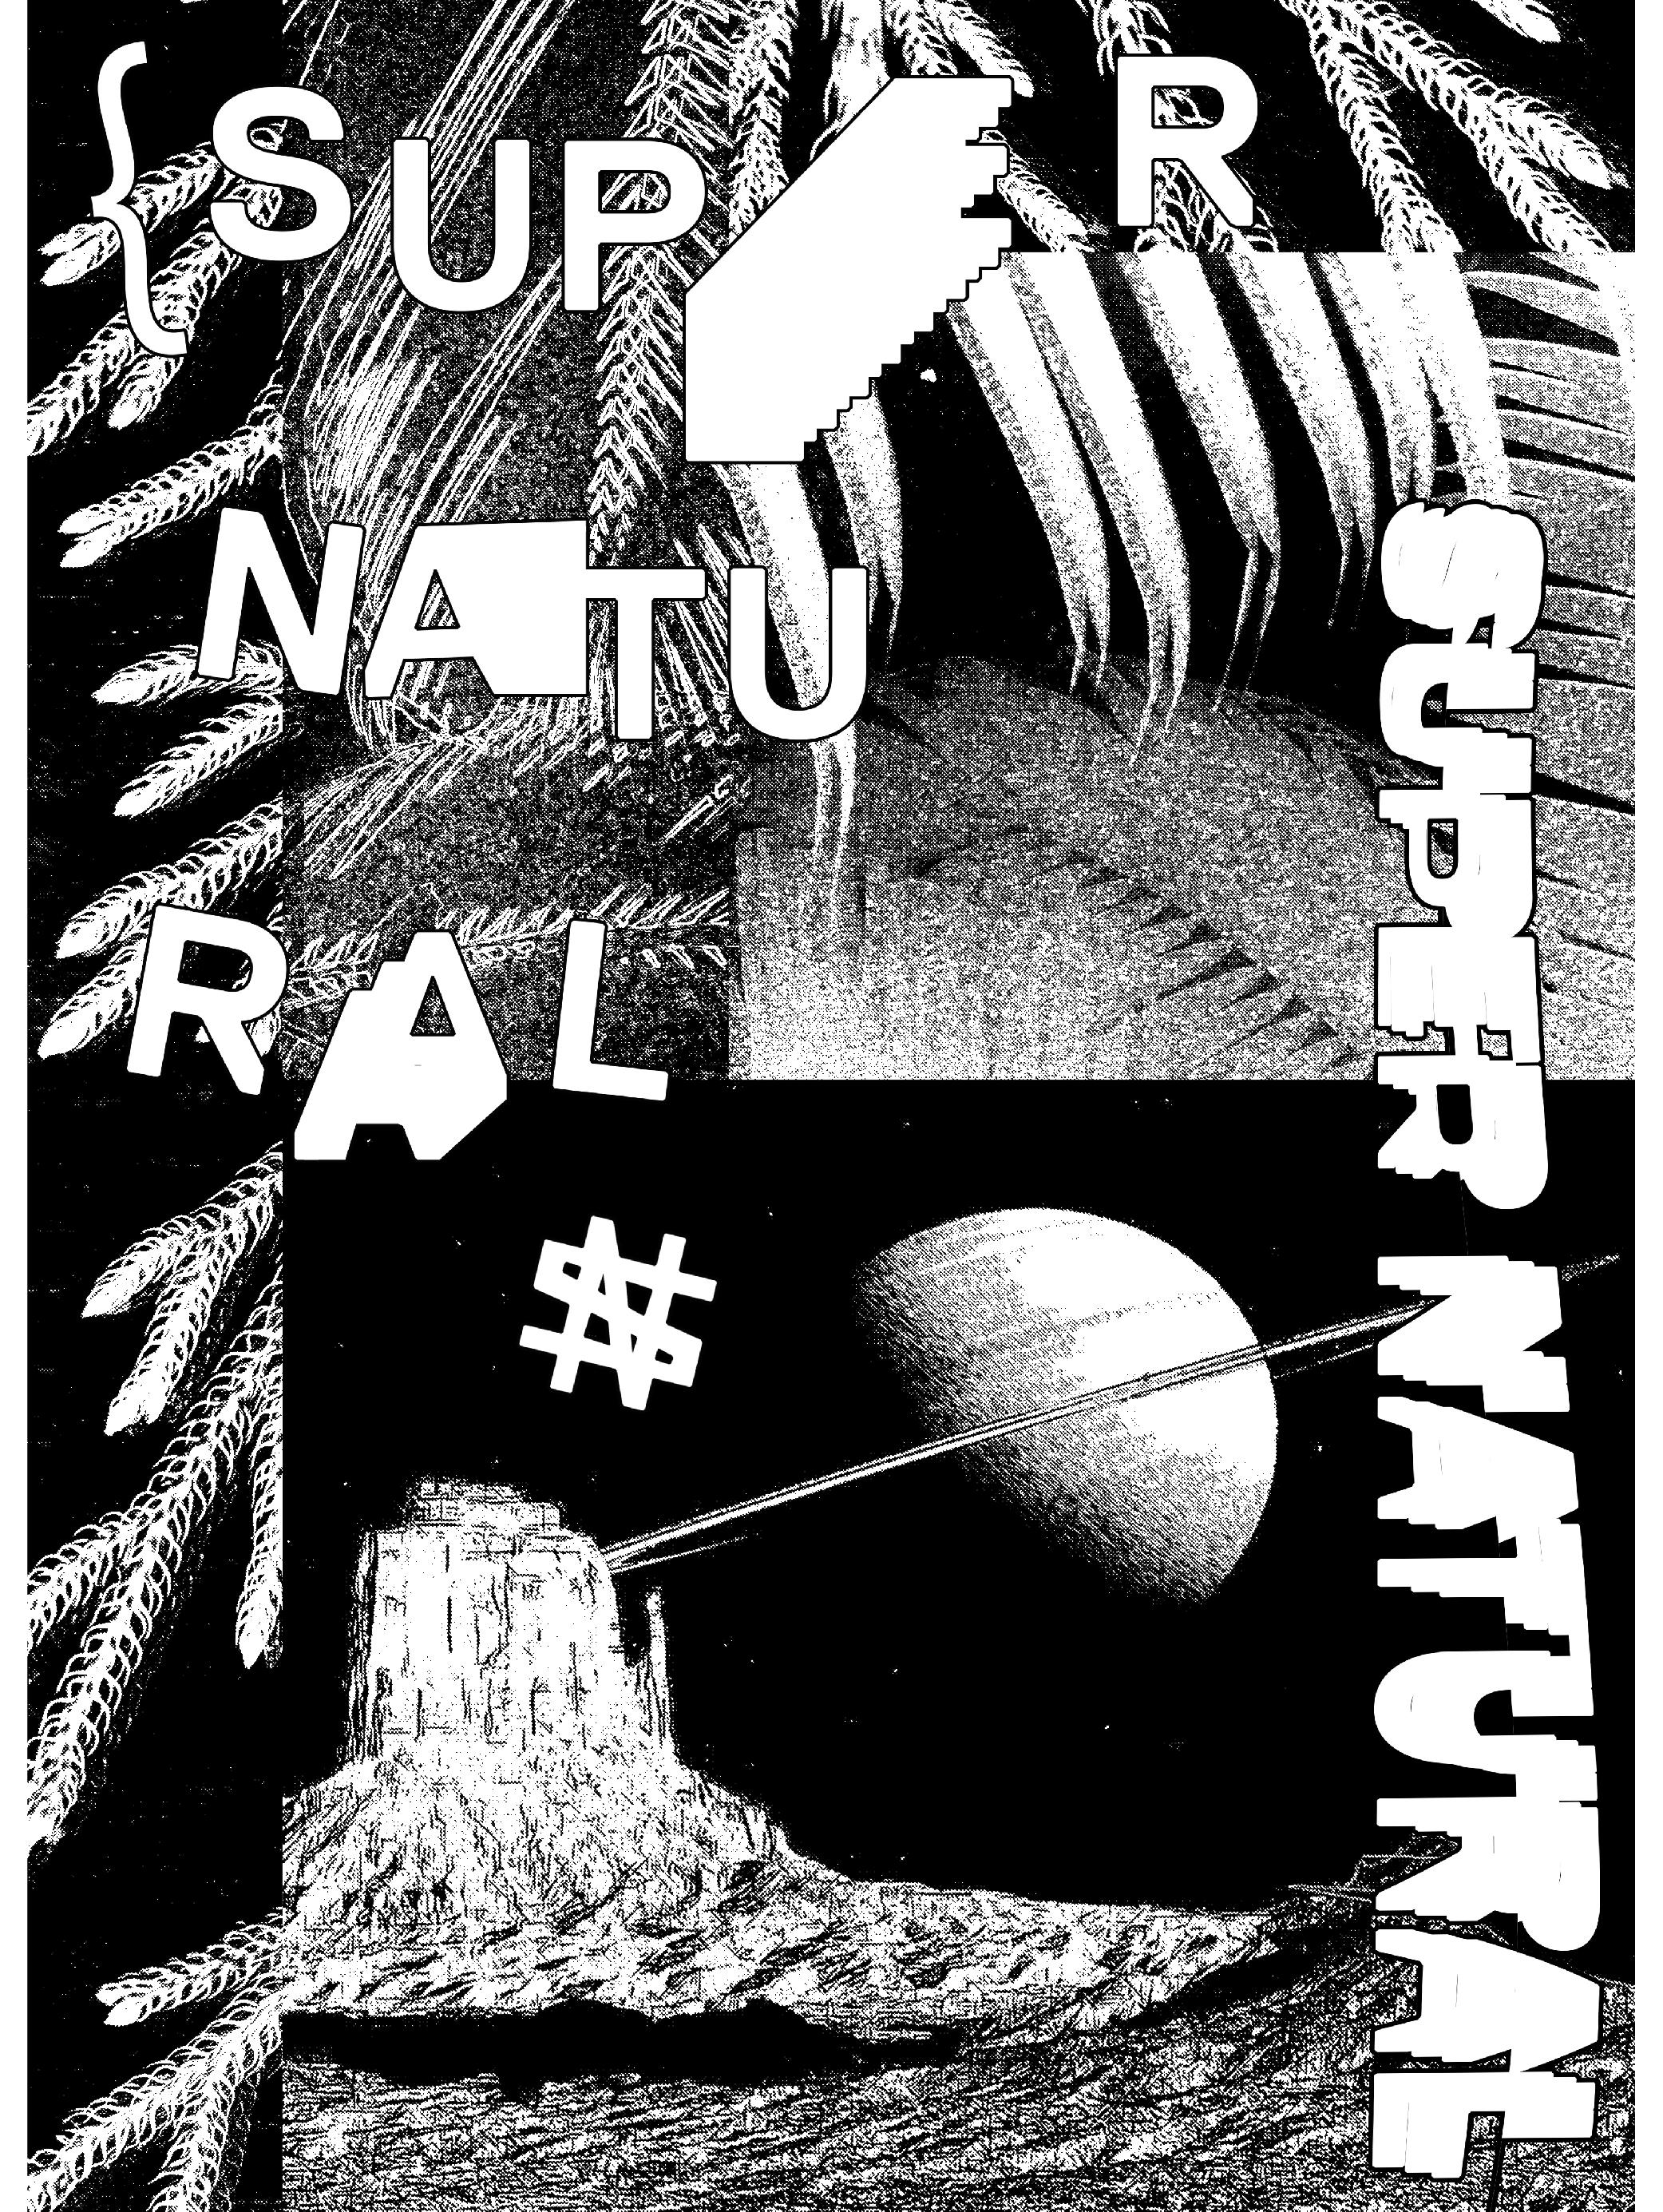 prints-04.jpg